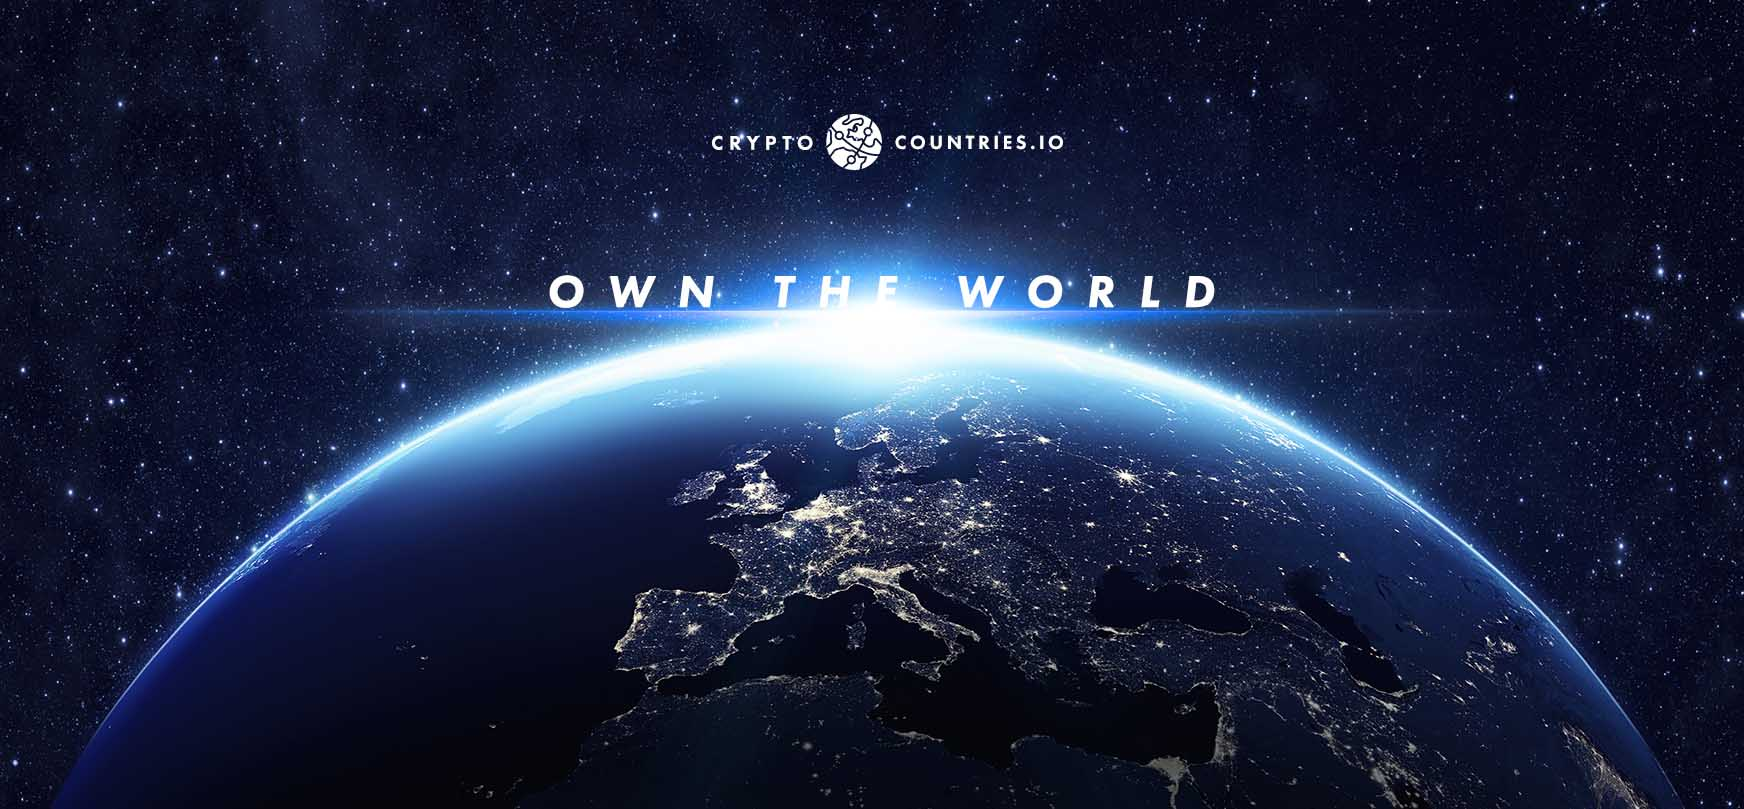 cryptocountries crypto countries blockchain bitcoin ethereum